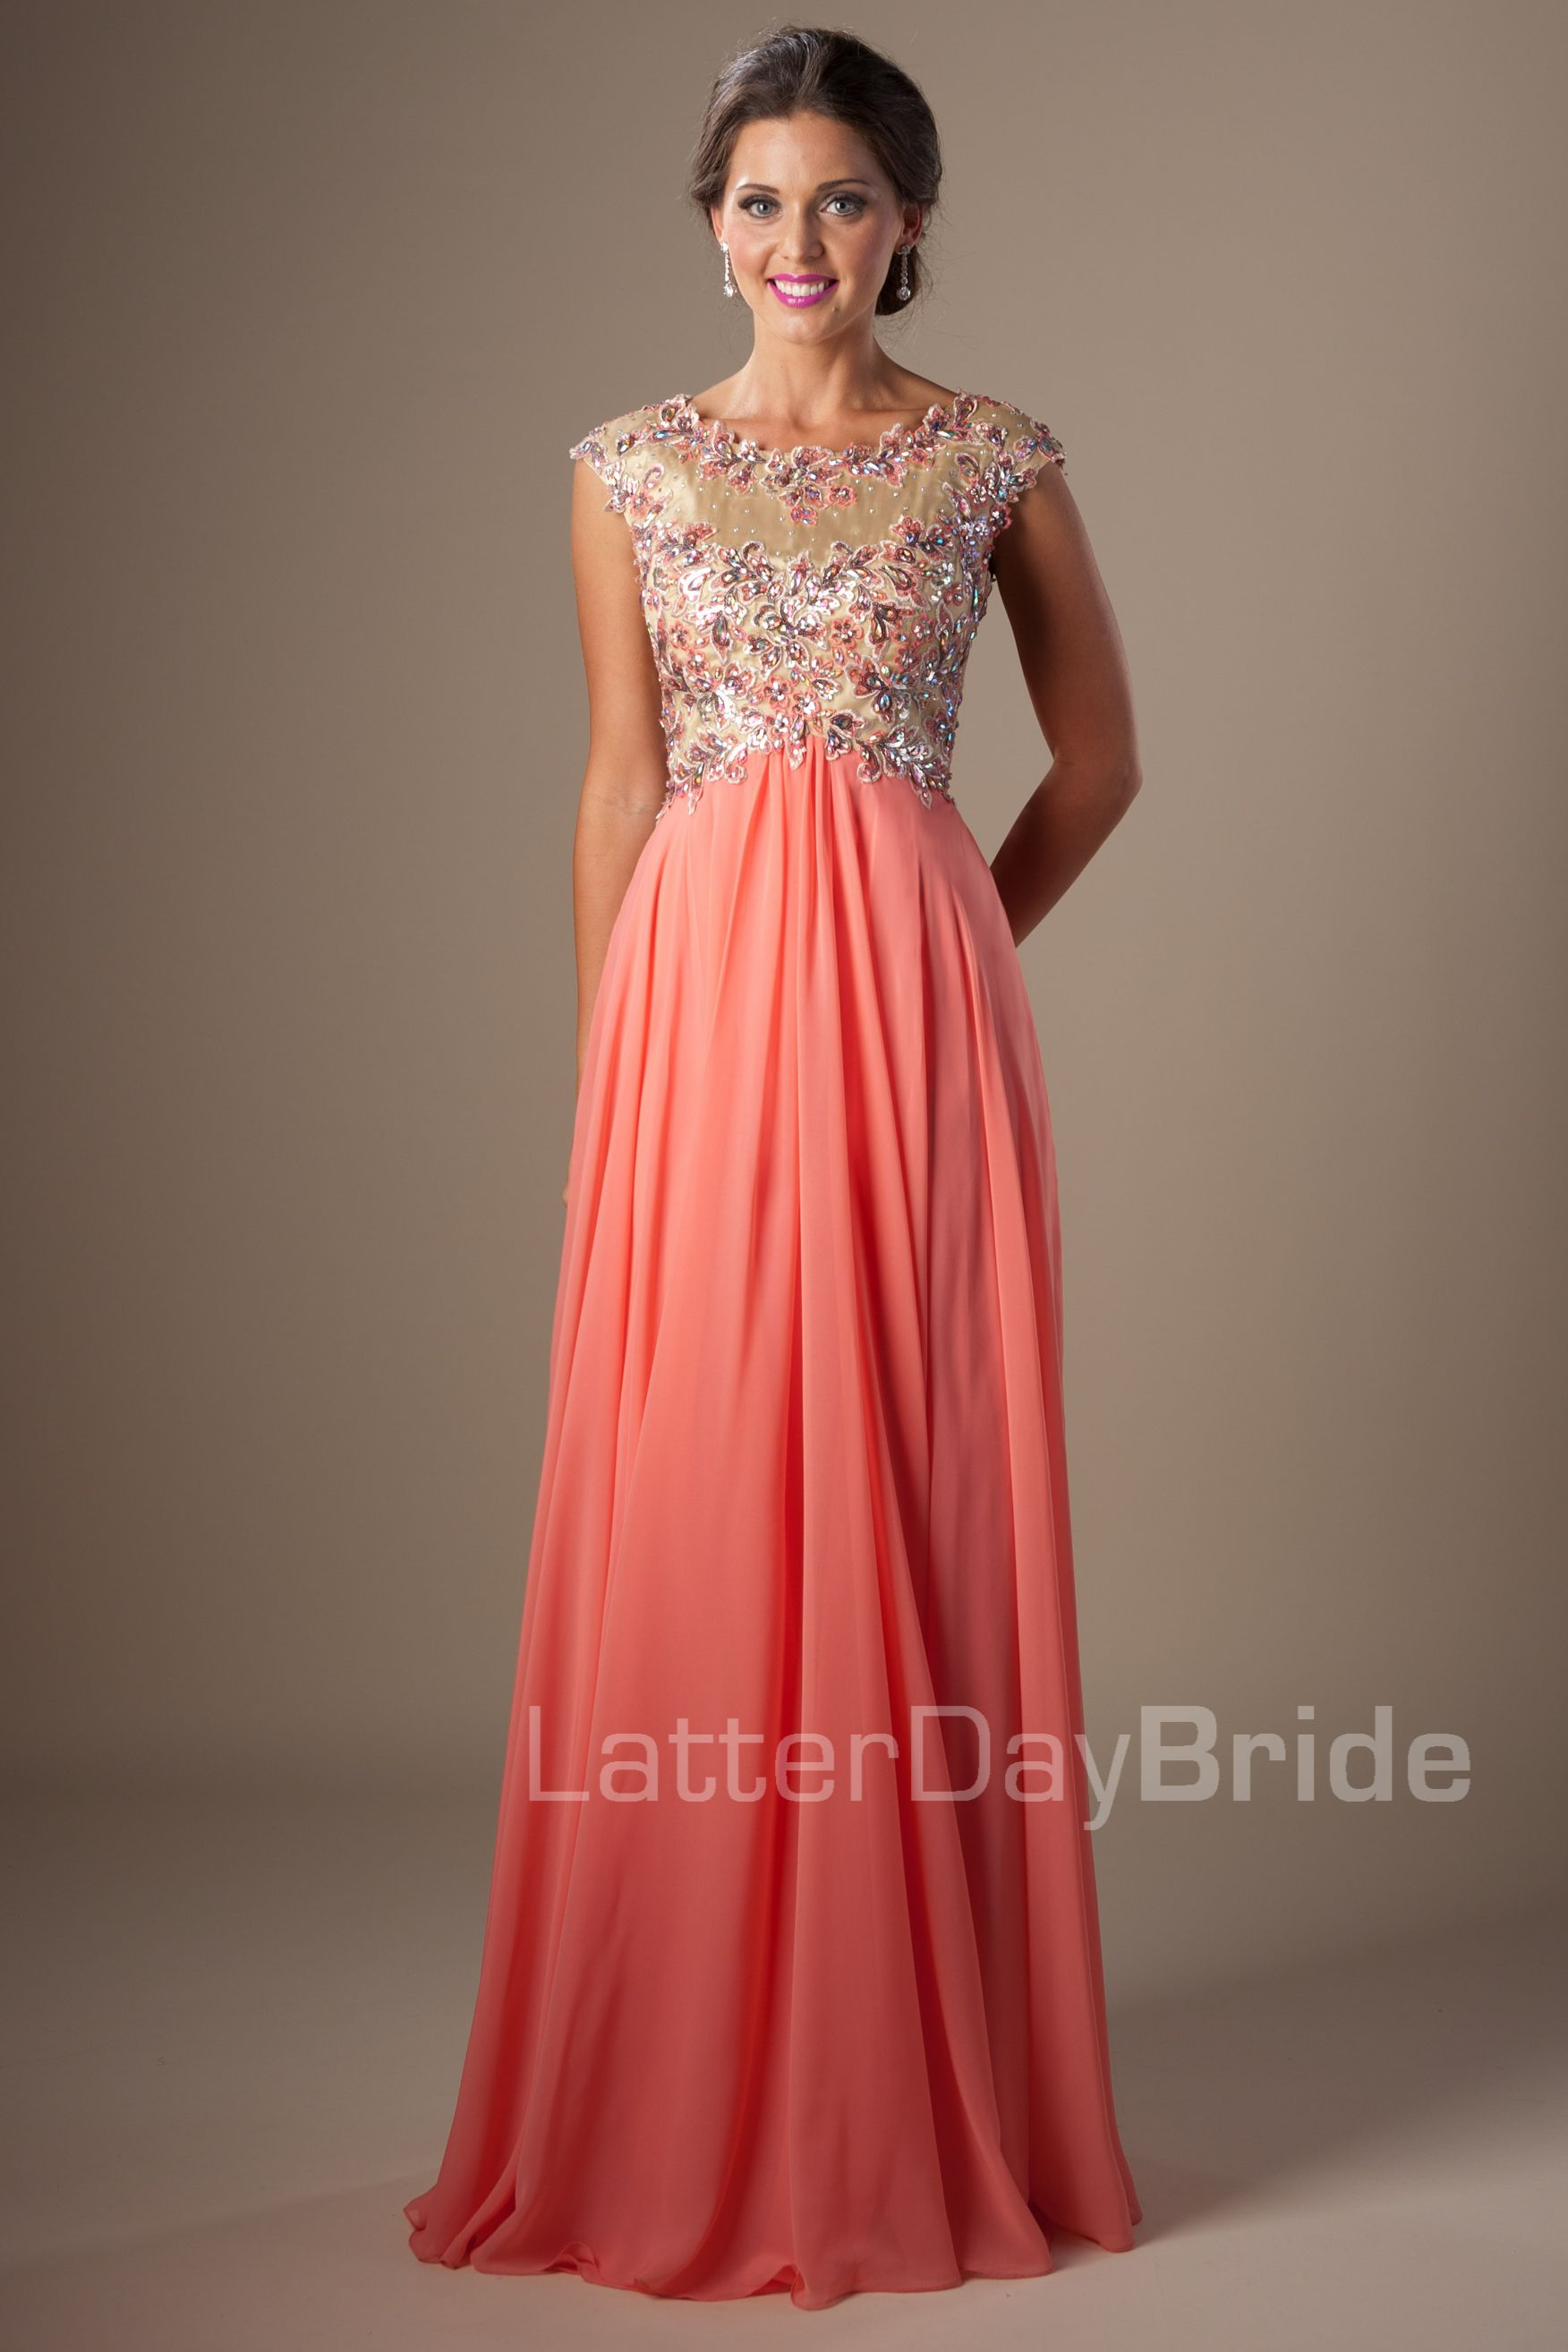 Modest prom dresses felicity prom uc pinterest modest prom